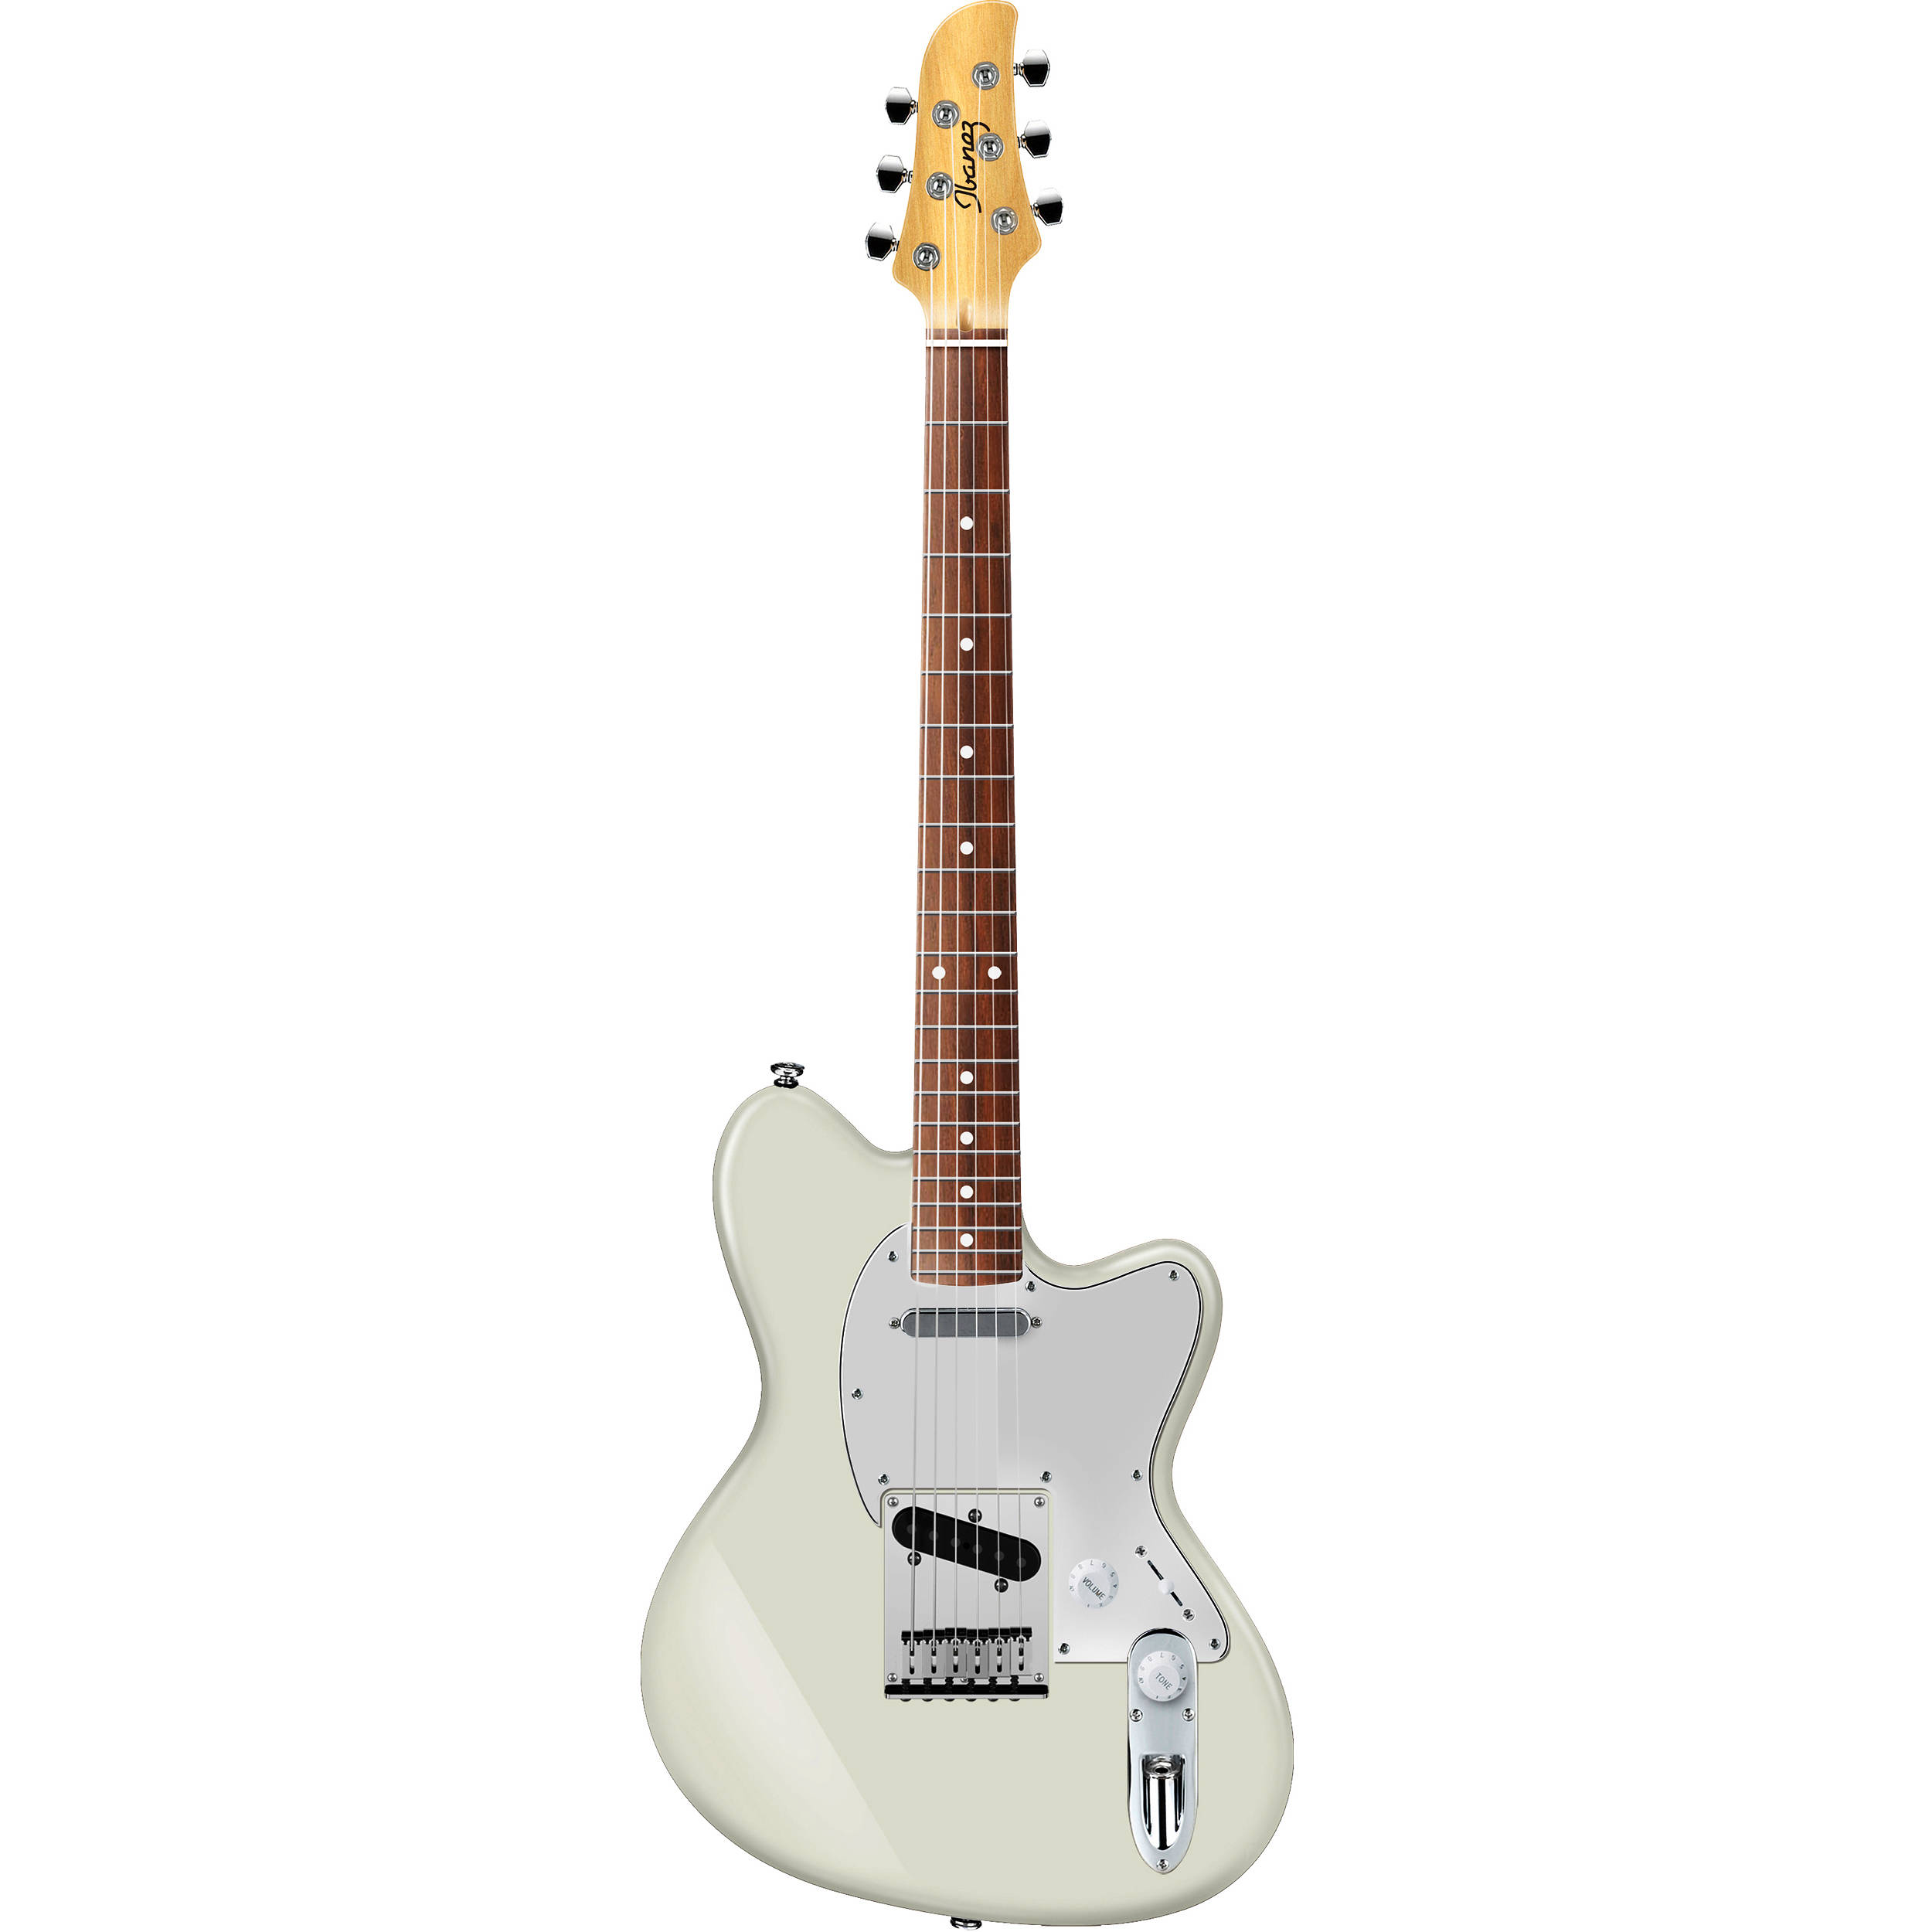 Ibanez Tm302 Talman Standard Series Electric Guitar